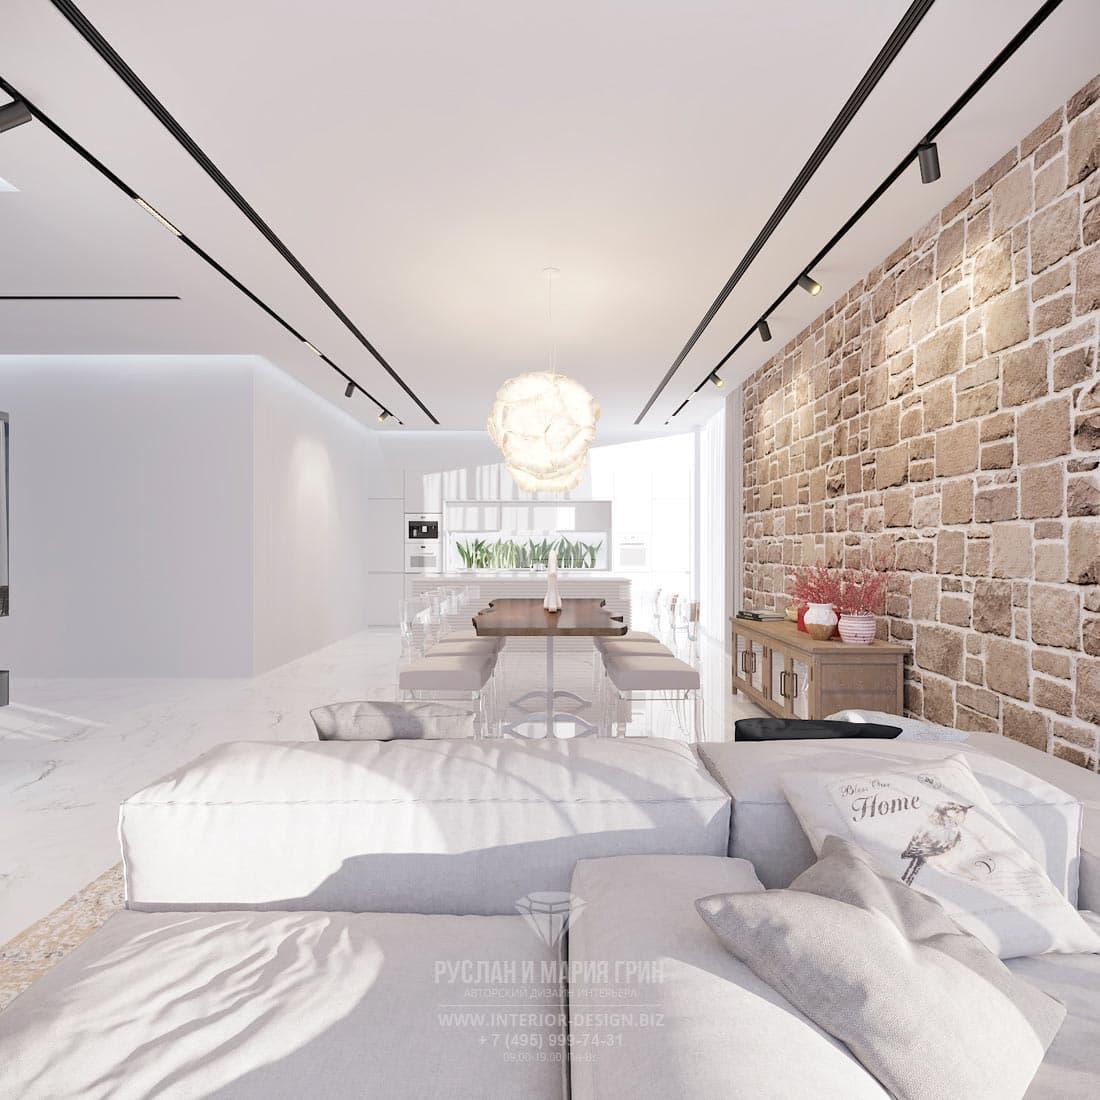 Интерьер квартиры в средиземноморском стиле